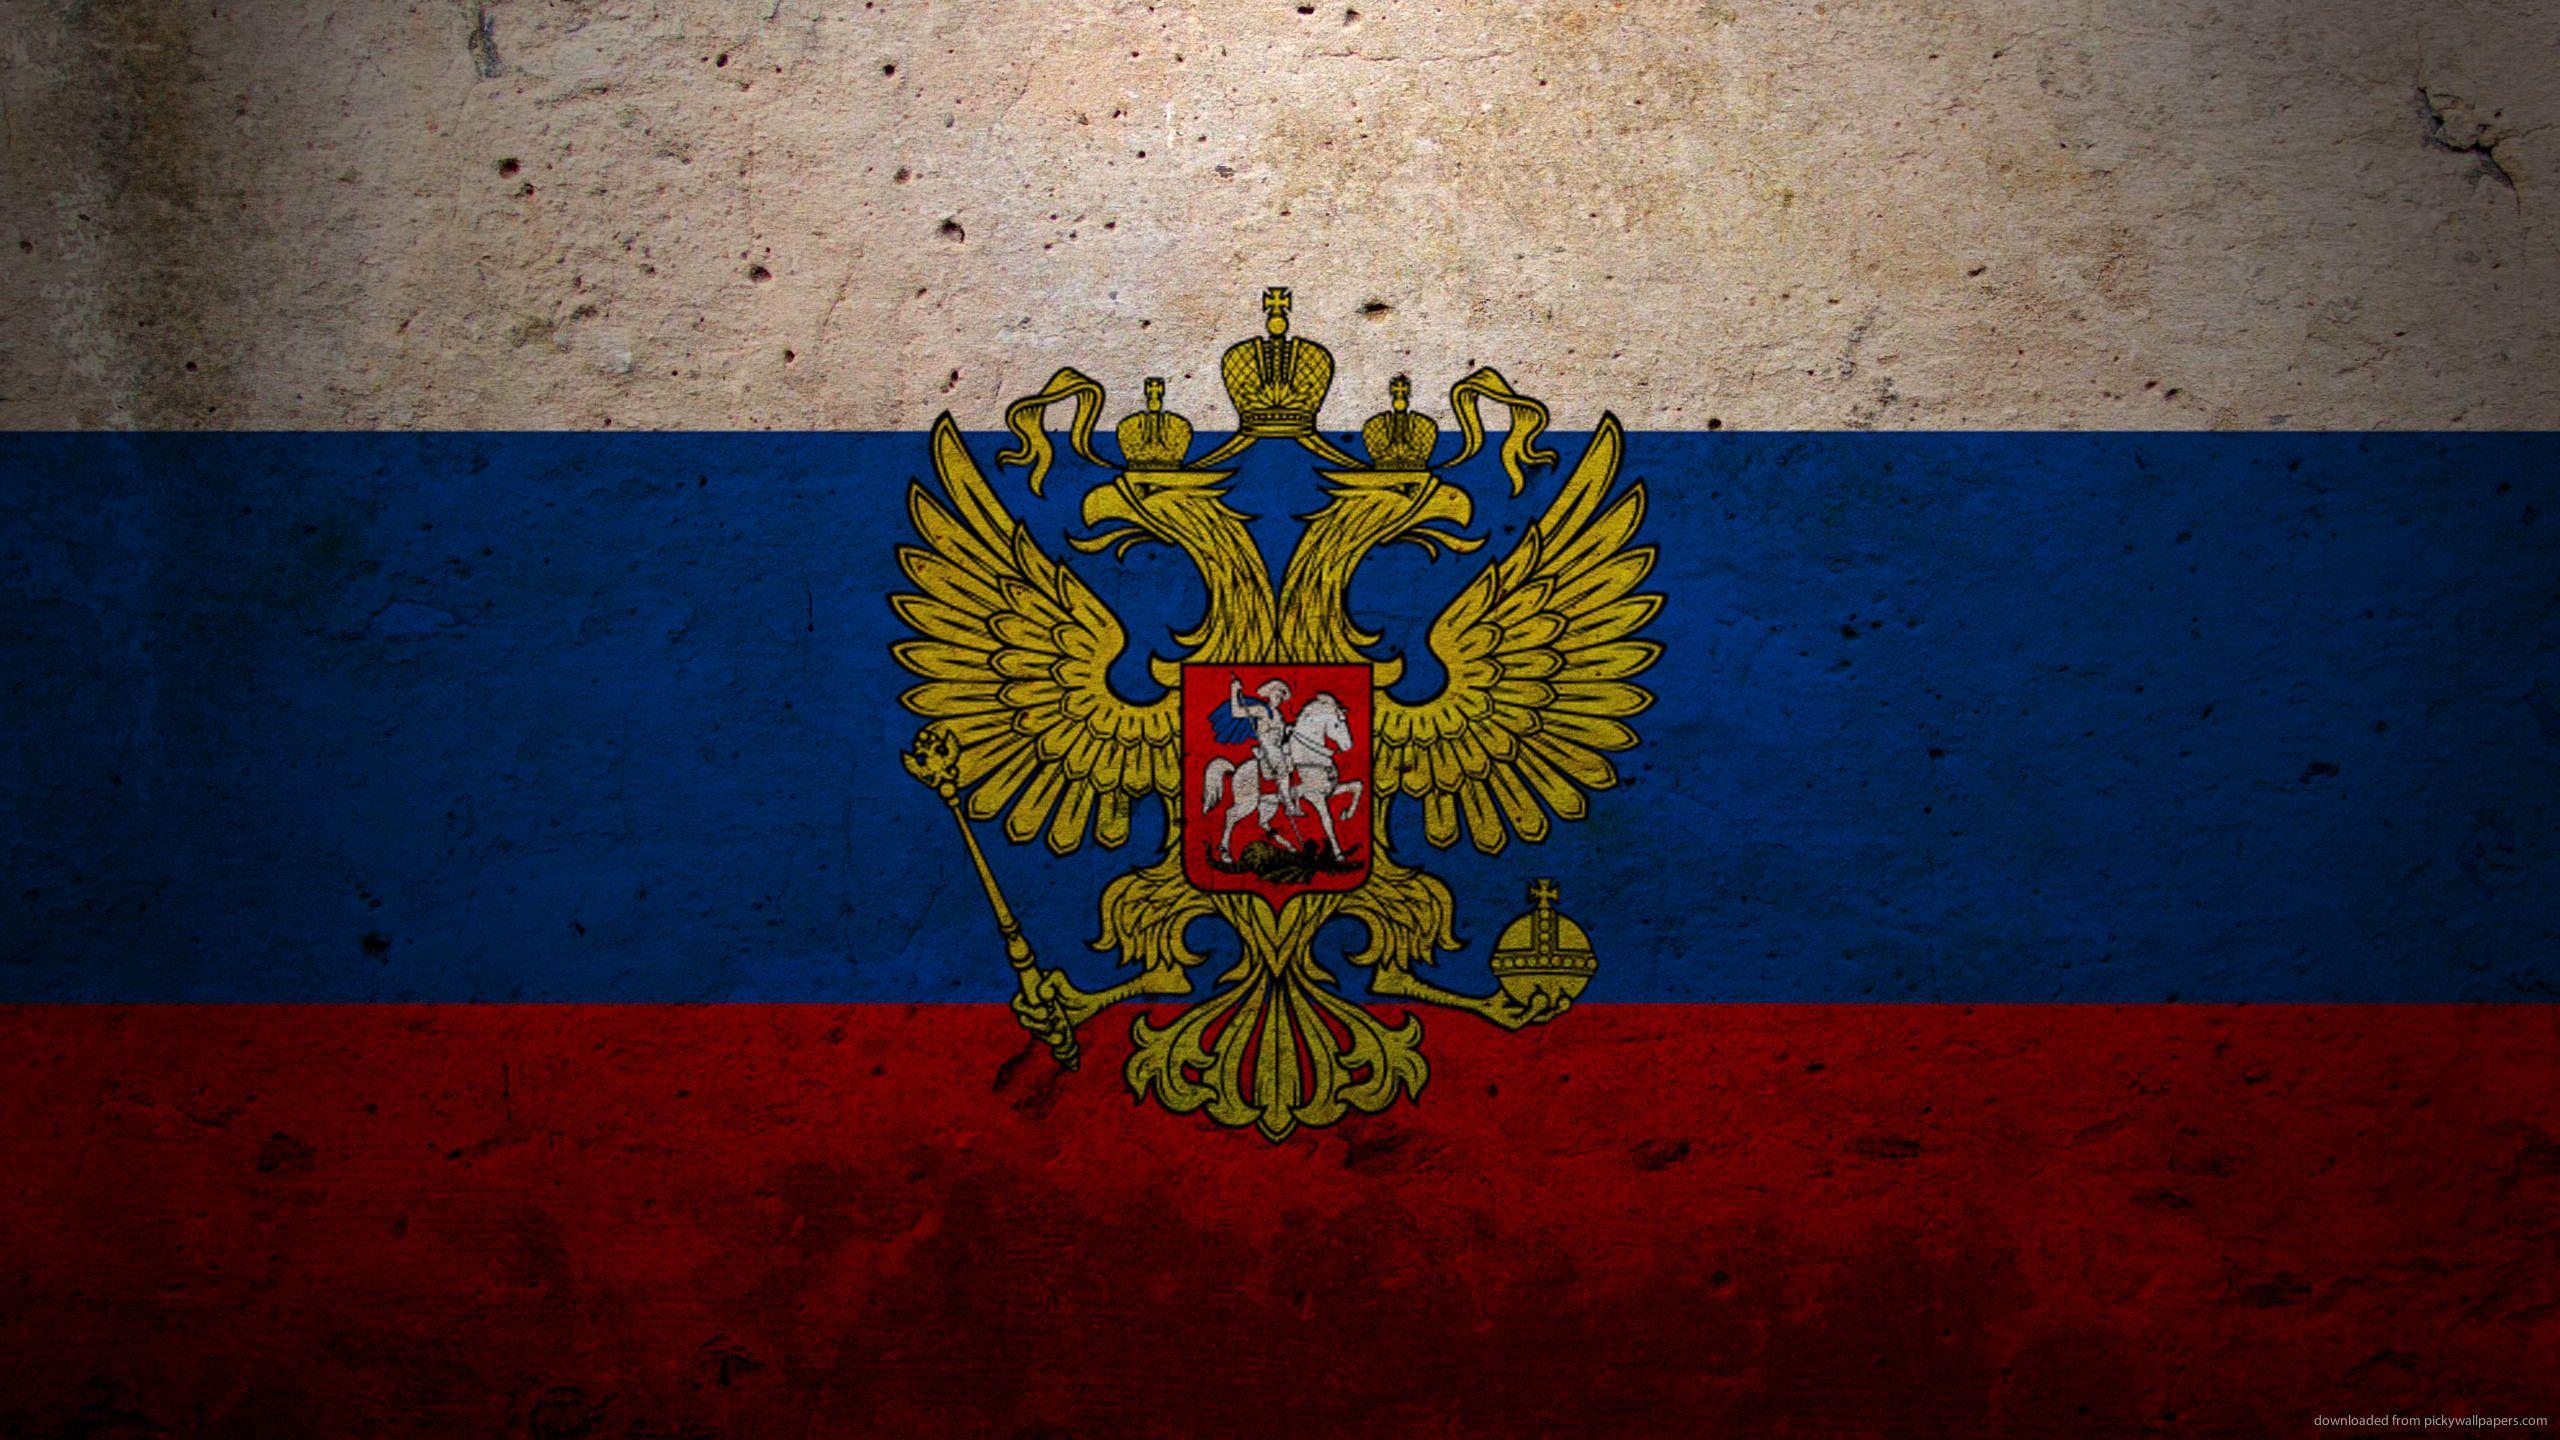 Russia cccp wallpapers hd wallpaper cave - 4k wallpaper russia ...